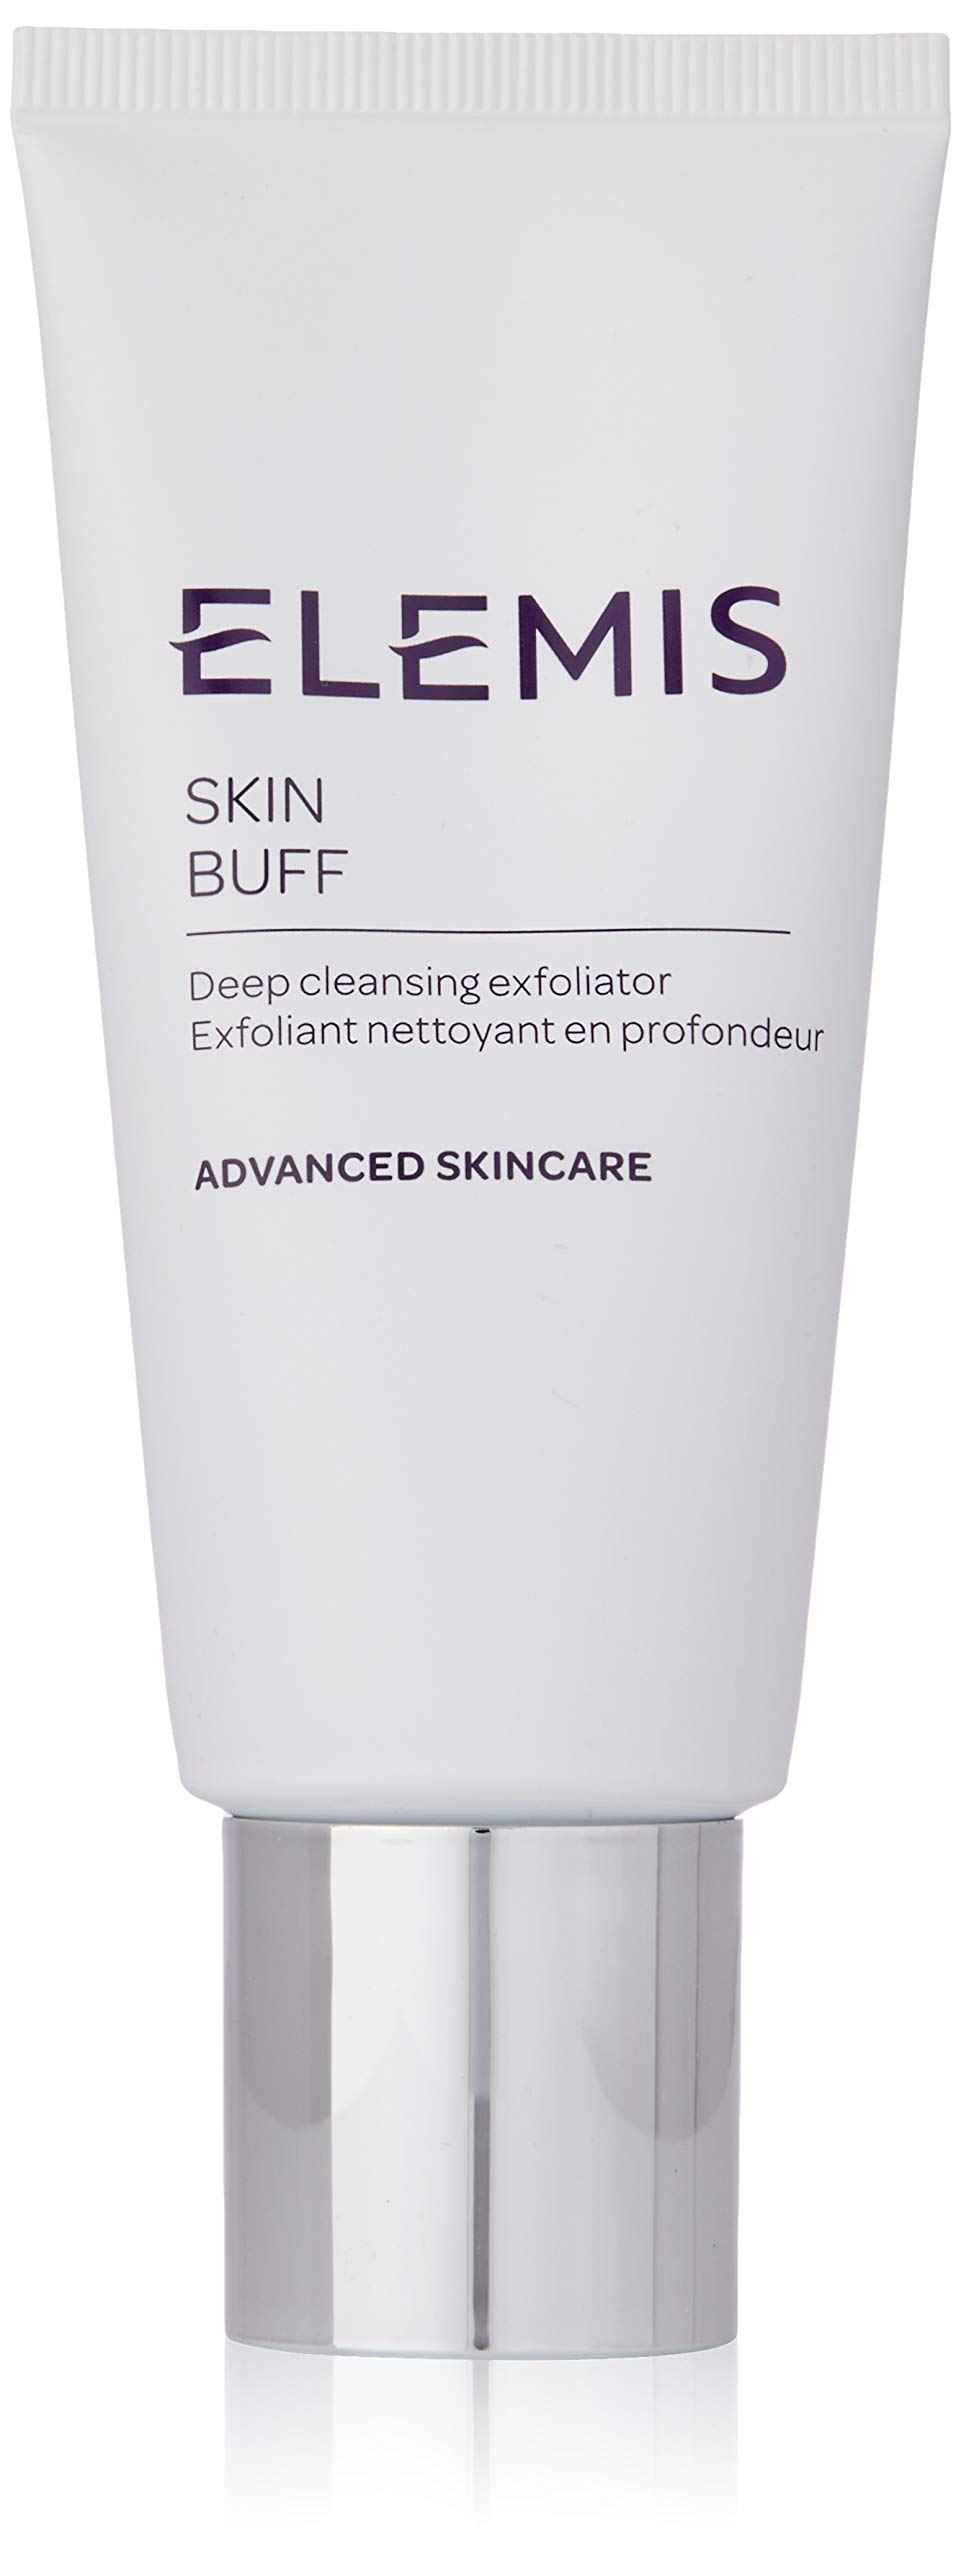 ELEMIS Skin Buff - Deep Cleansing Exfoliator